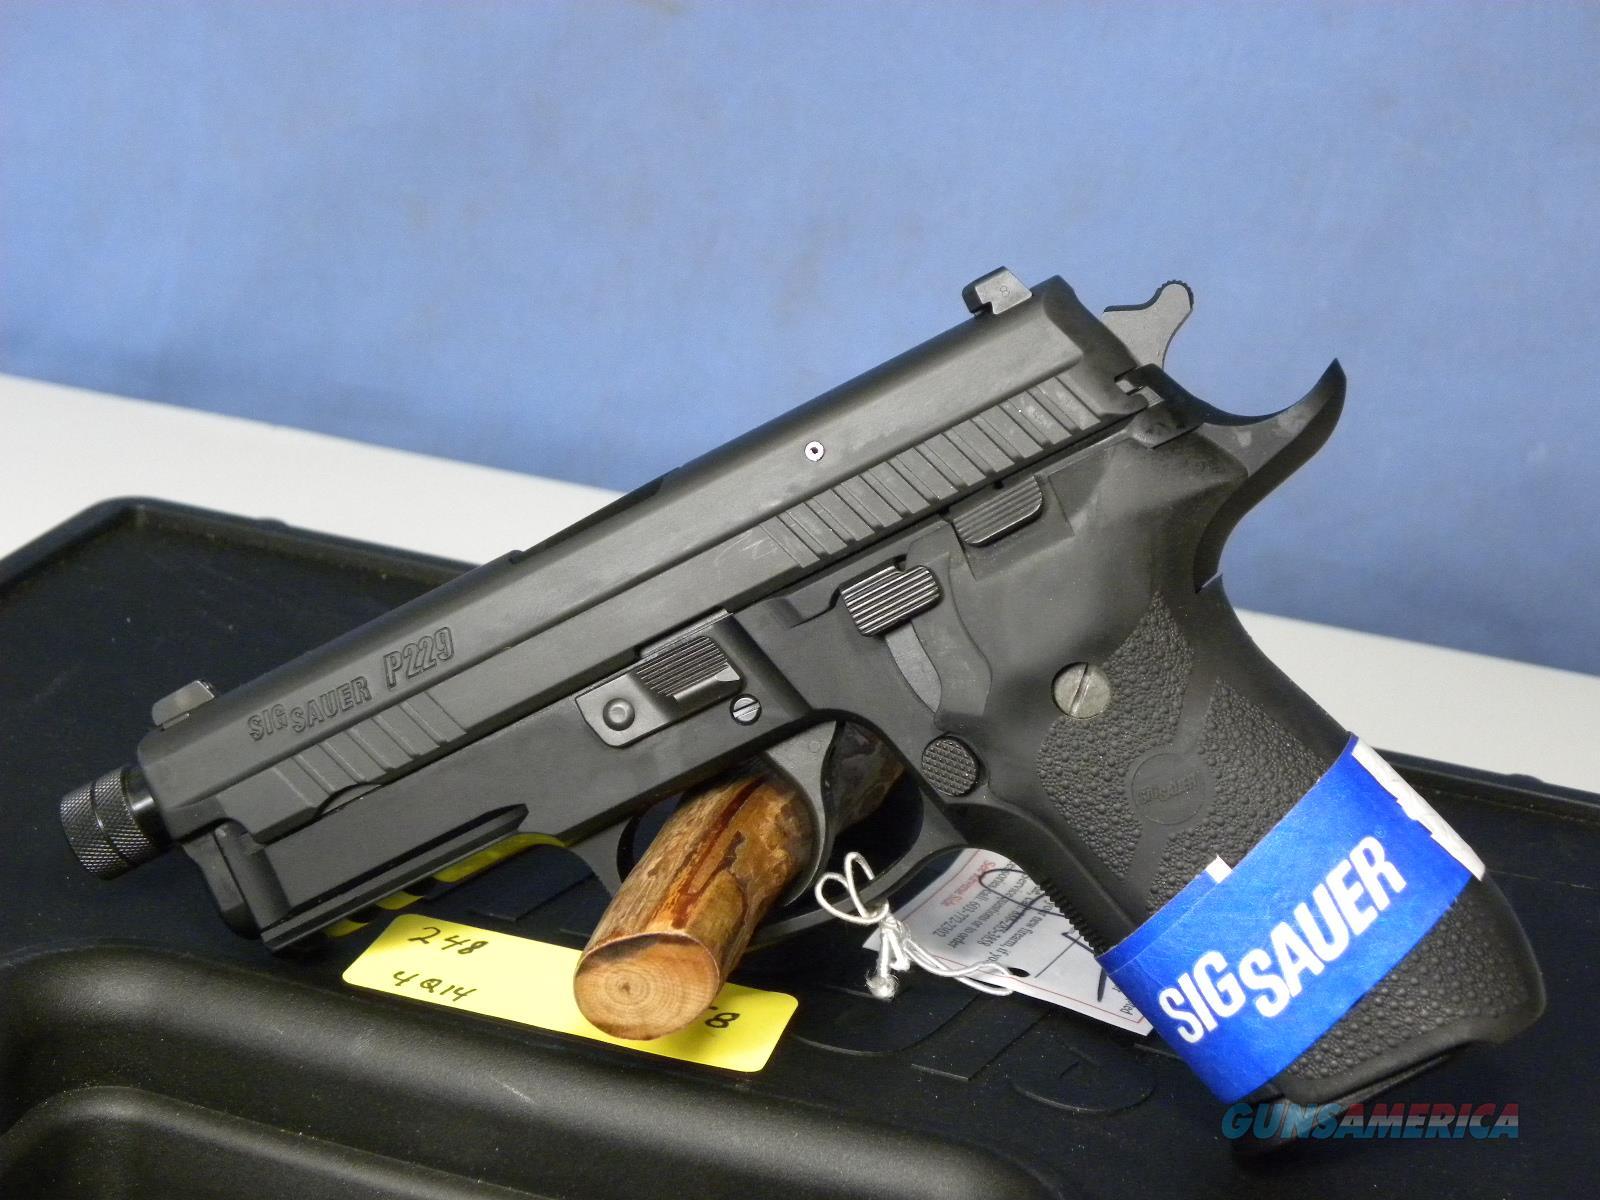 Sig Sauer 229R-9-BSS-USTB Threaded Barrel  Guns > Pistols > Sig - Sauer/Sigarms Pistols > P229